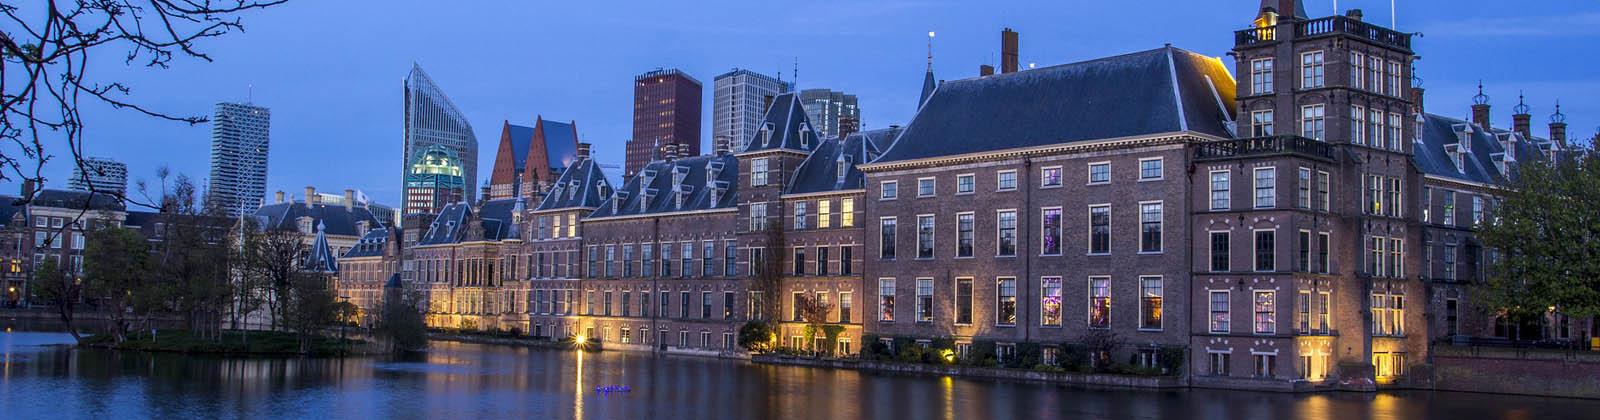 DMC-The-Hague-travel-agency